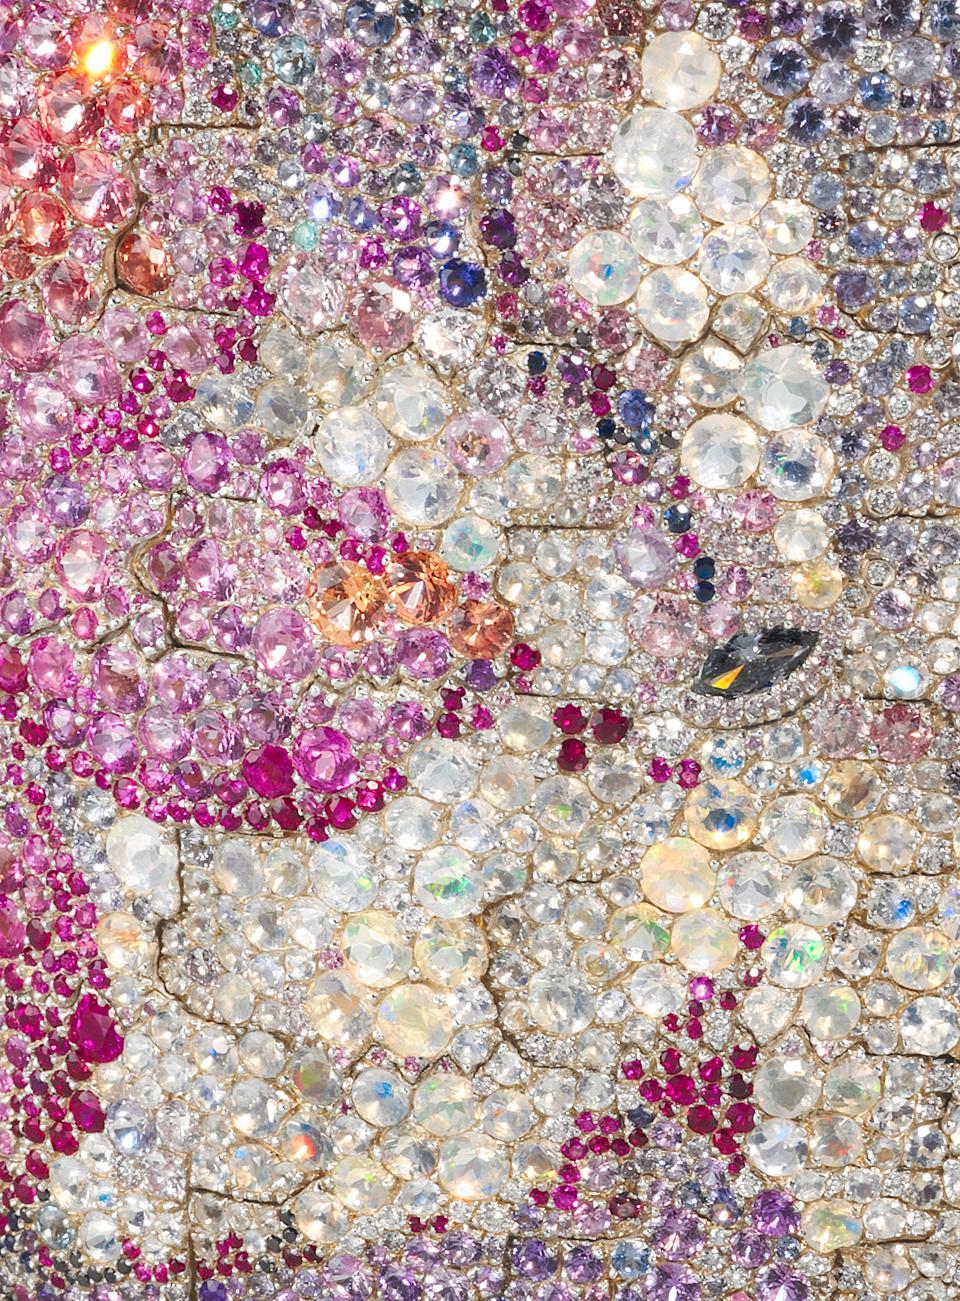 Colored diamonds other stones glisten in the Les Nymphéas bracelet by Frédéric Zaavy